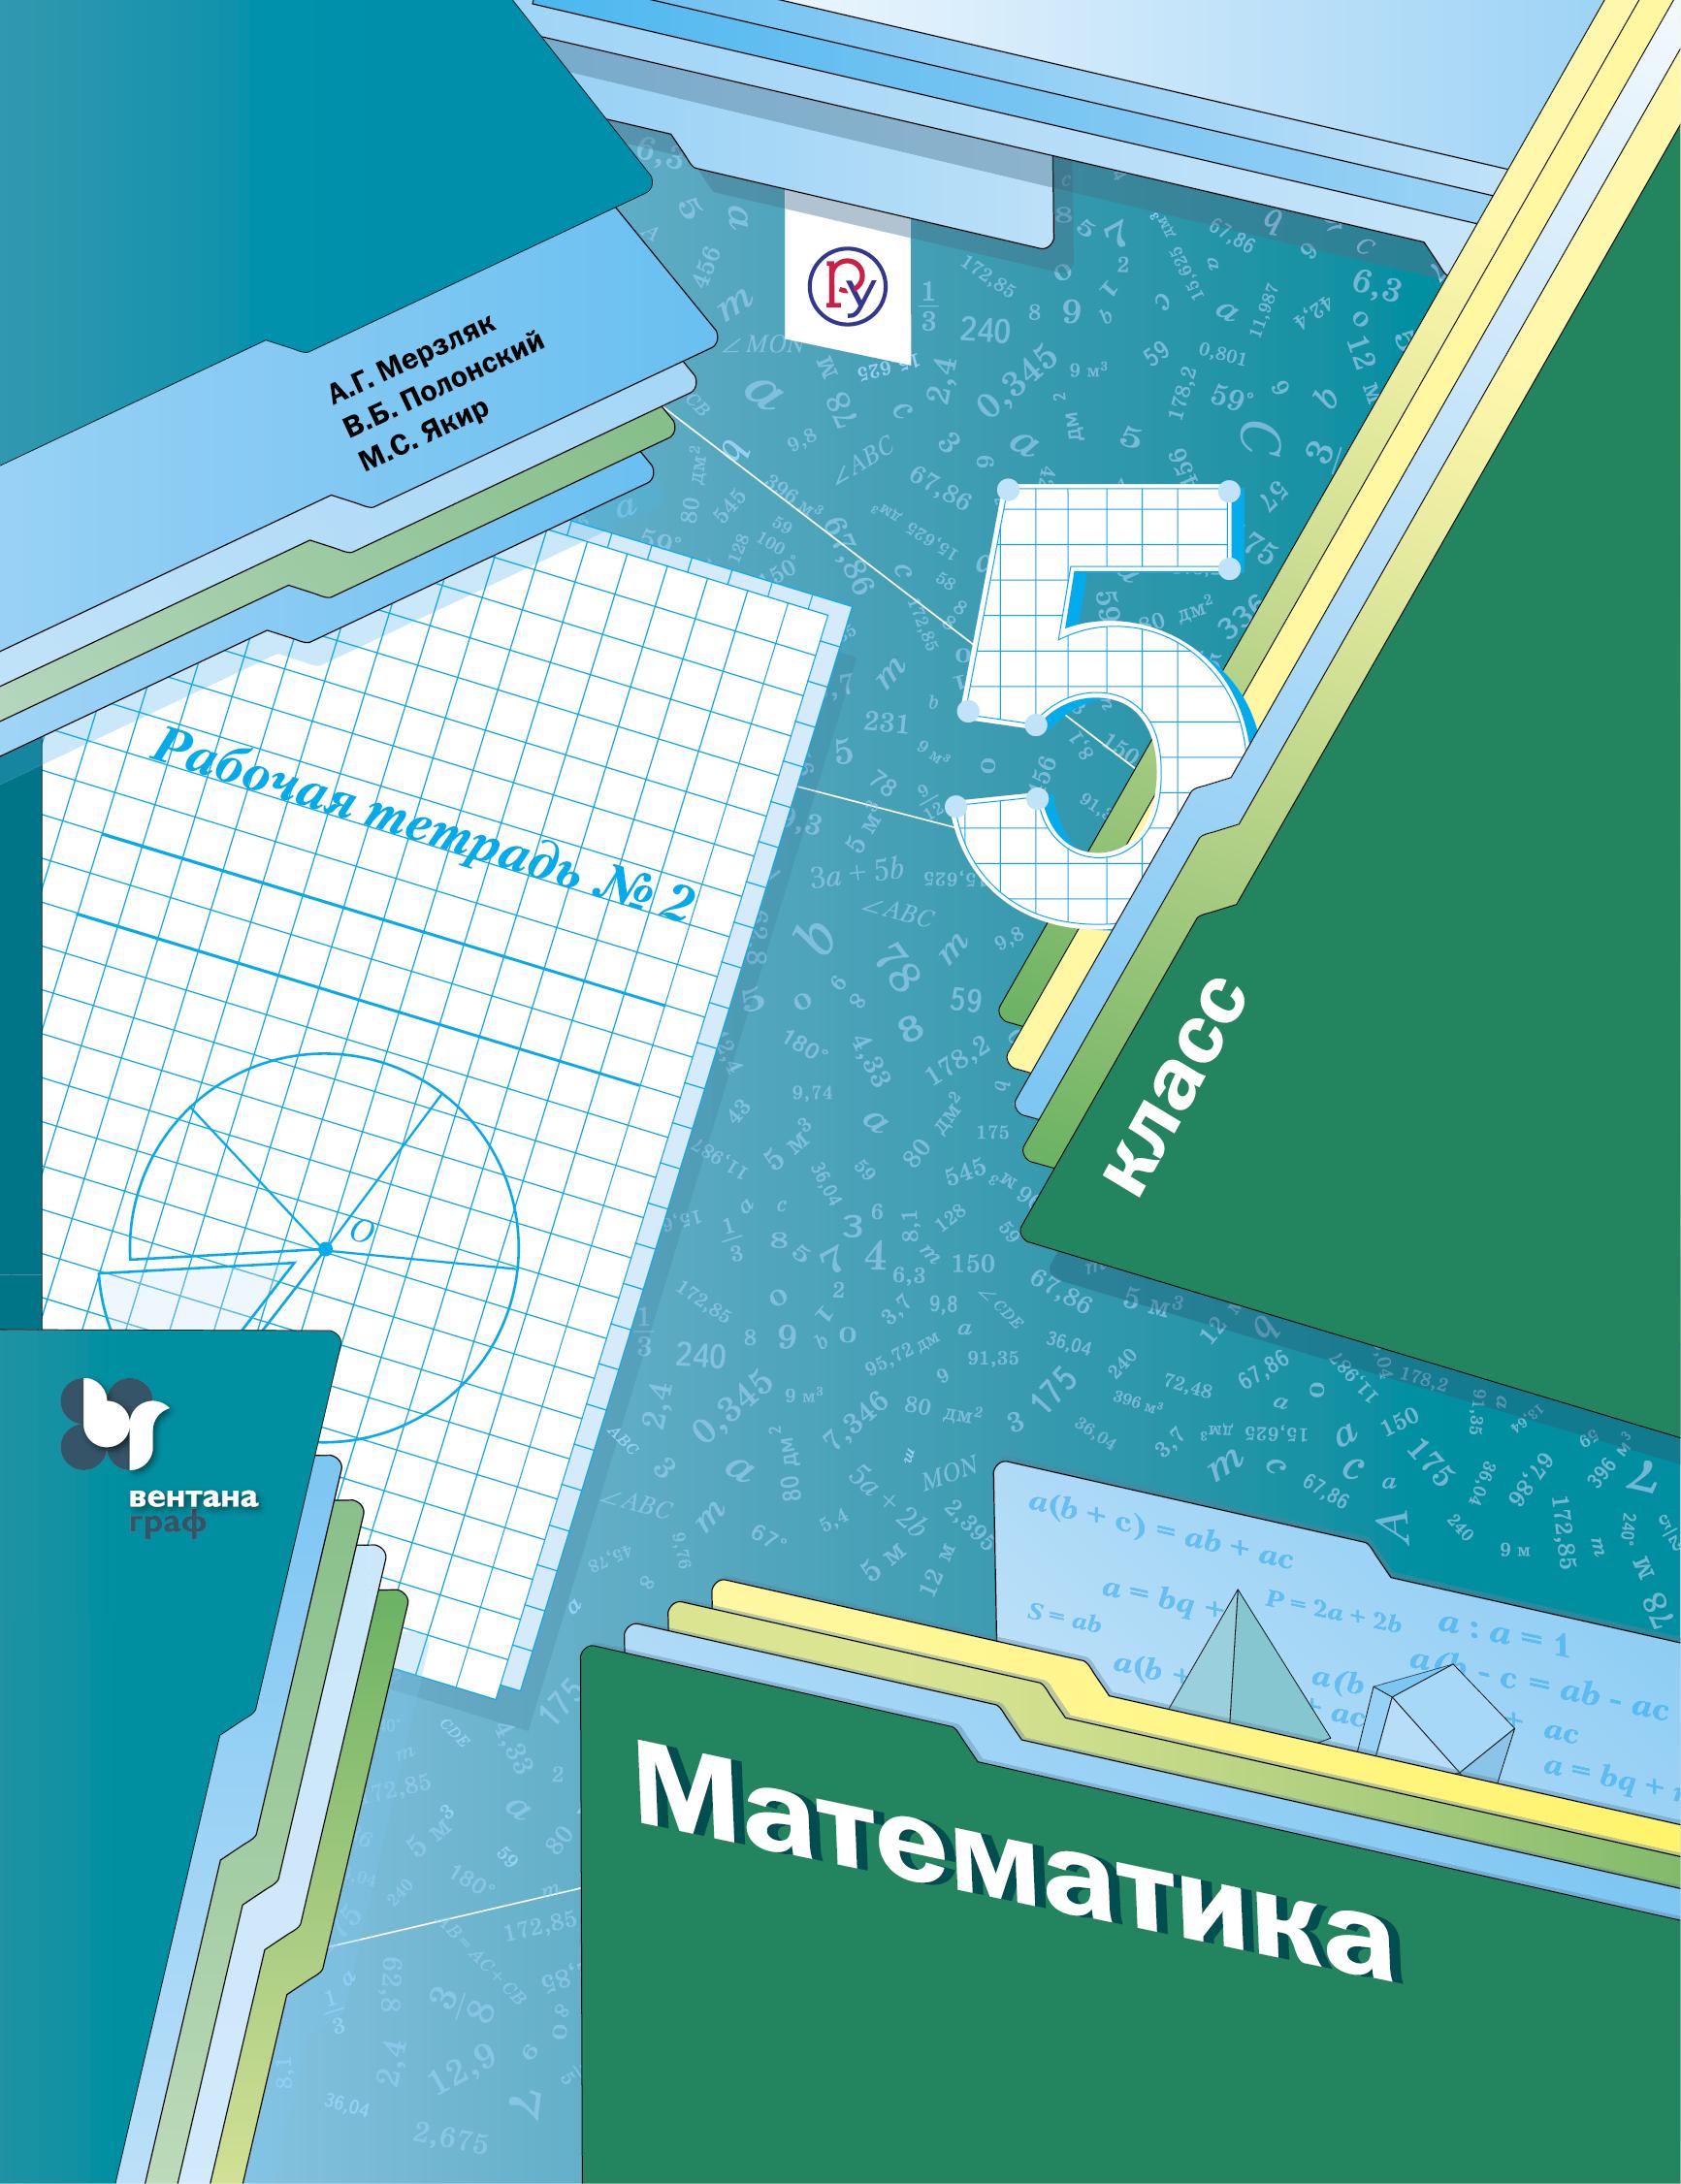 МерзлякА.Г., ПолонскийВ.Б., ЯкирМ.С. Математика. 5класс. Рабочая тетрадь №2. цены онлайн